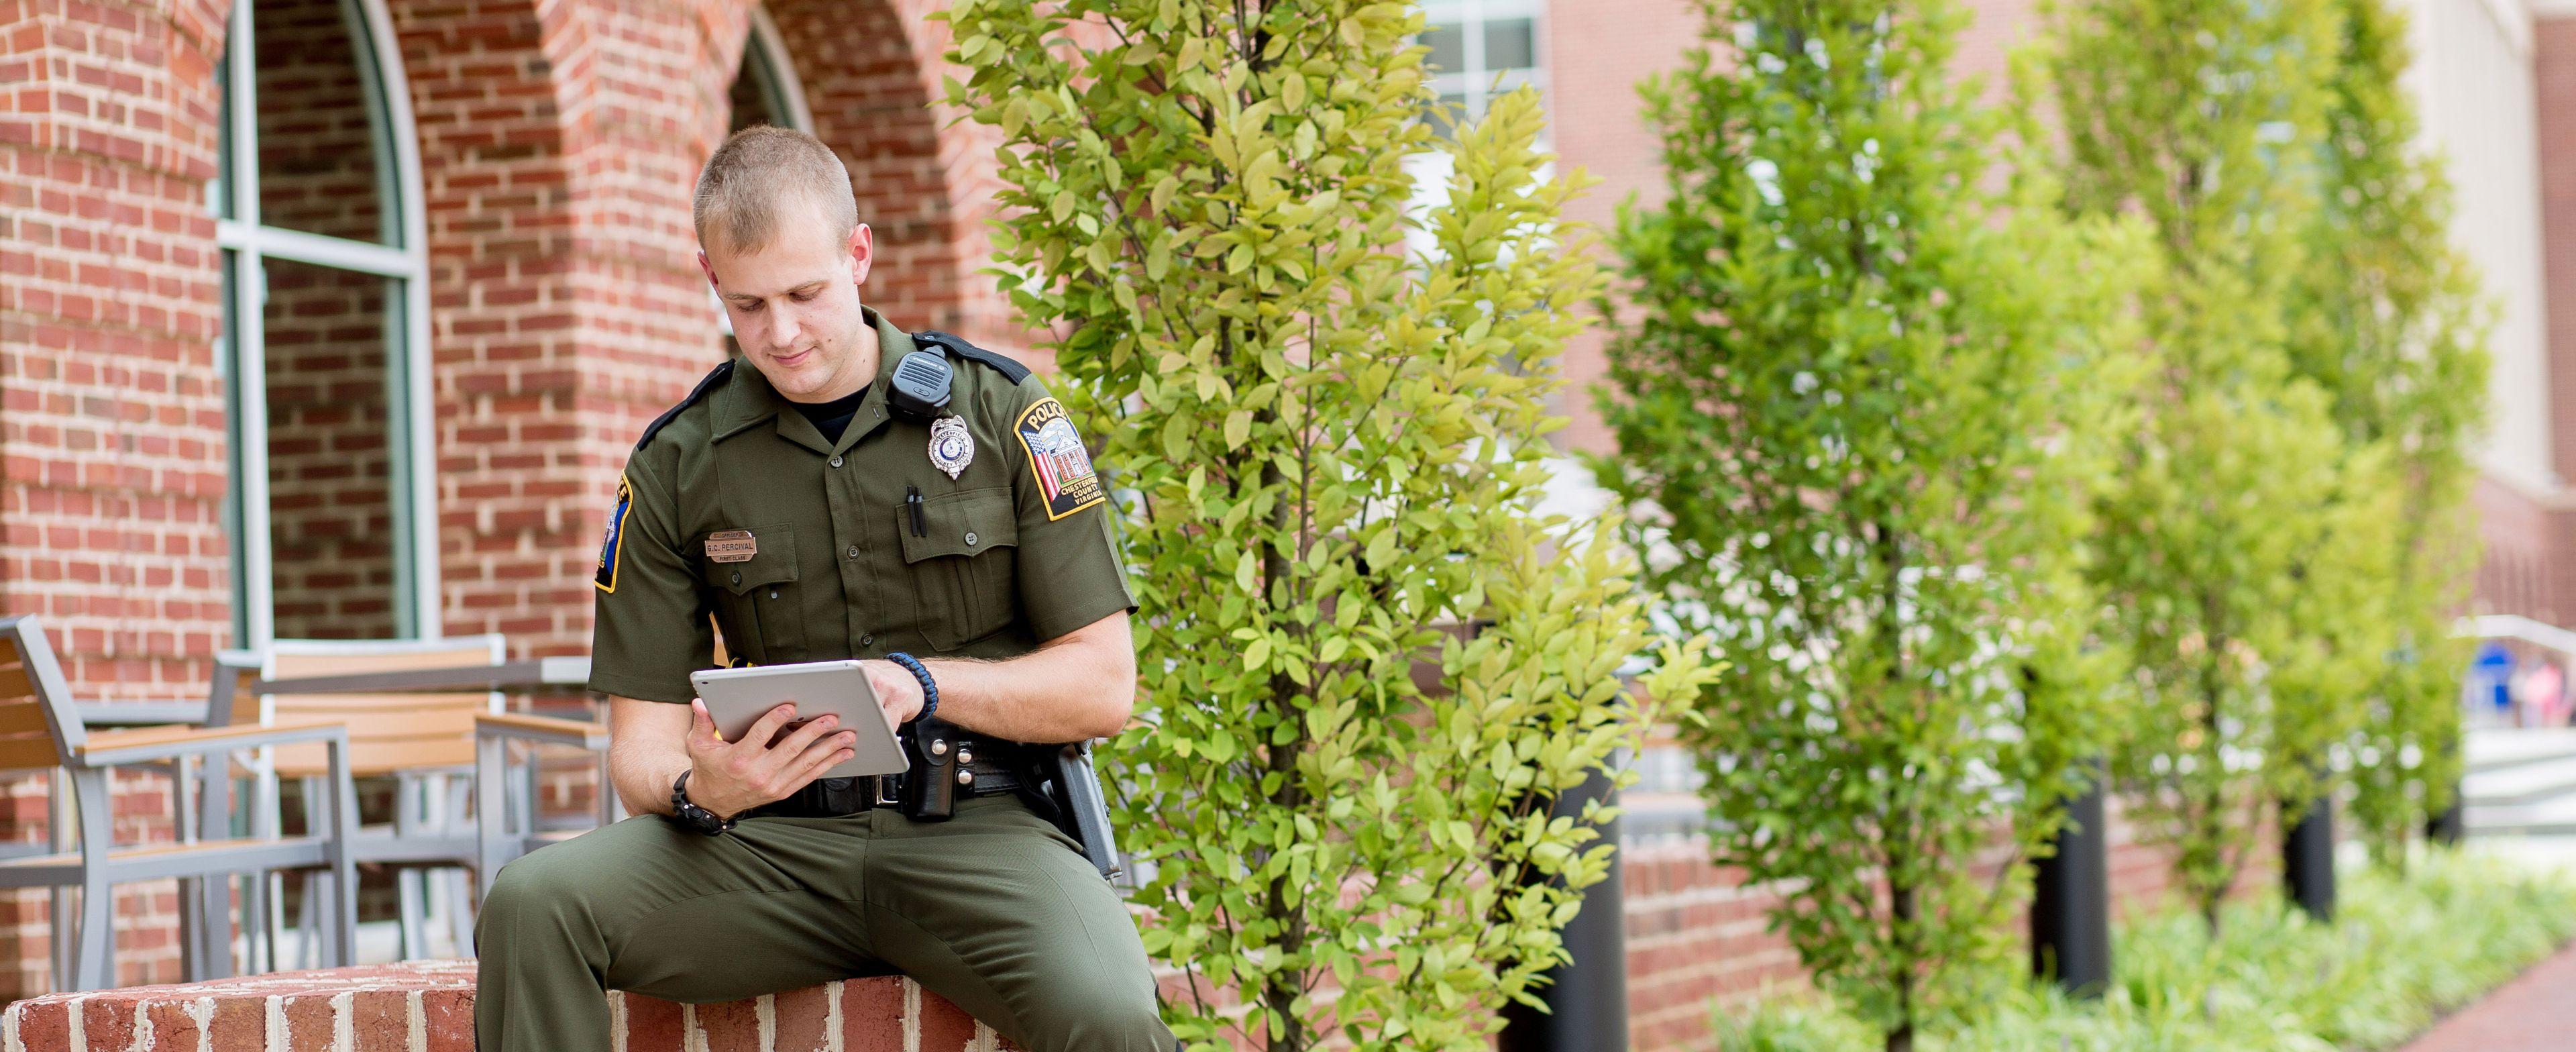 Online MBA - Online Master Of Business Administration in Criminal Justice Administration Online Degree Program